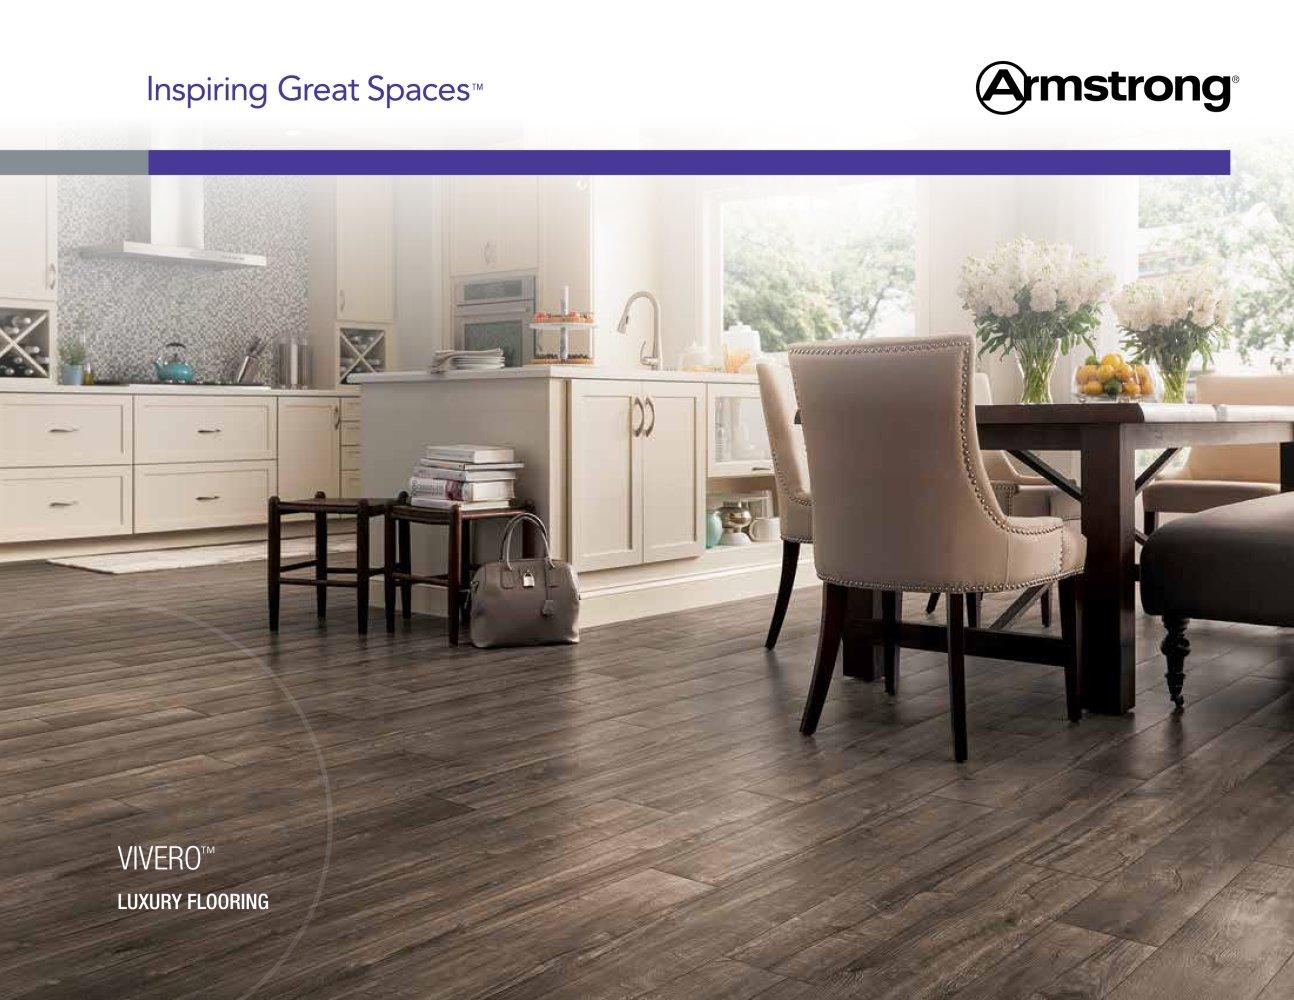 Vivero Luxury Flooring 1 40 Pages